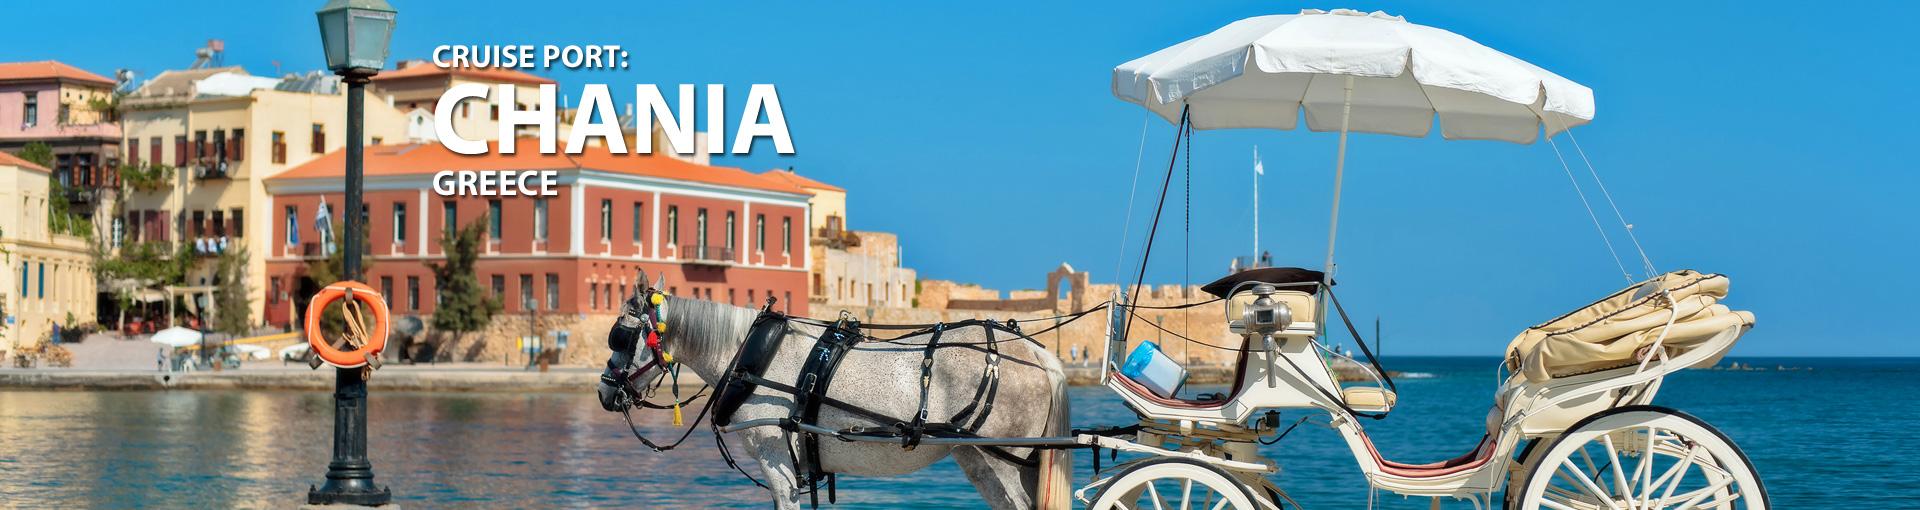 Cruises to Chania, Greece